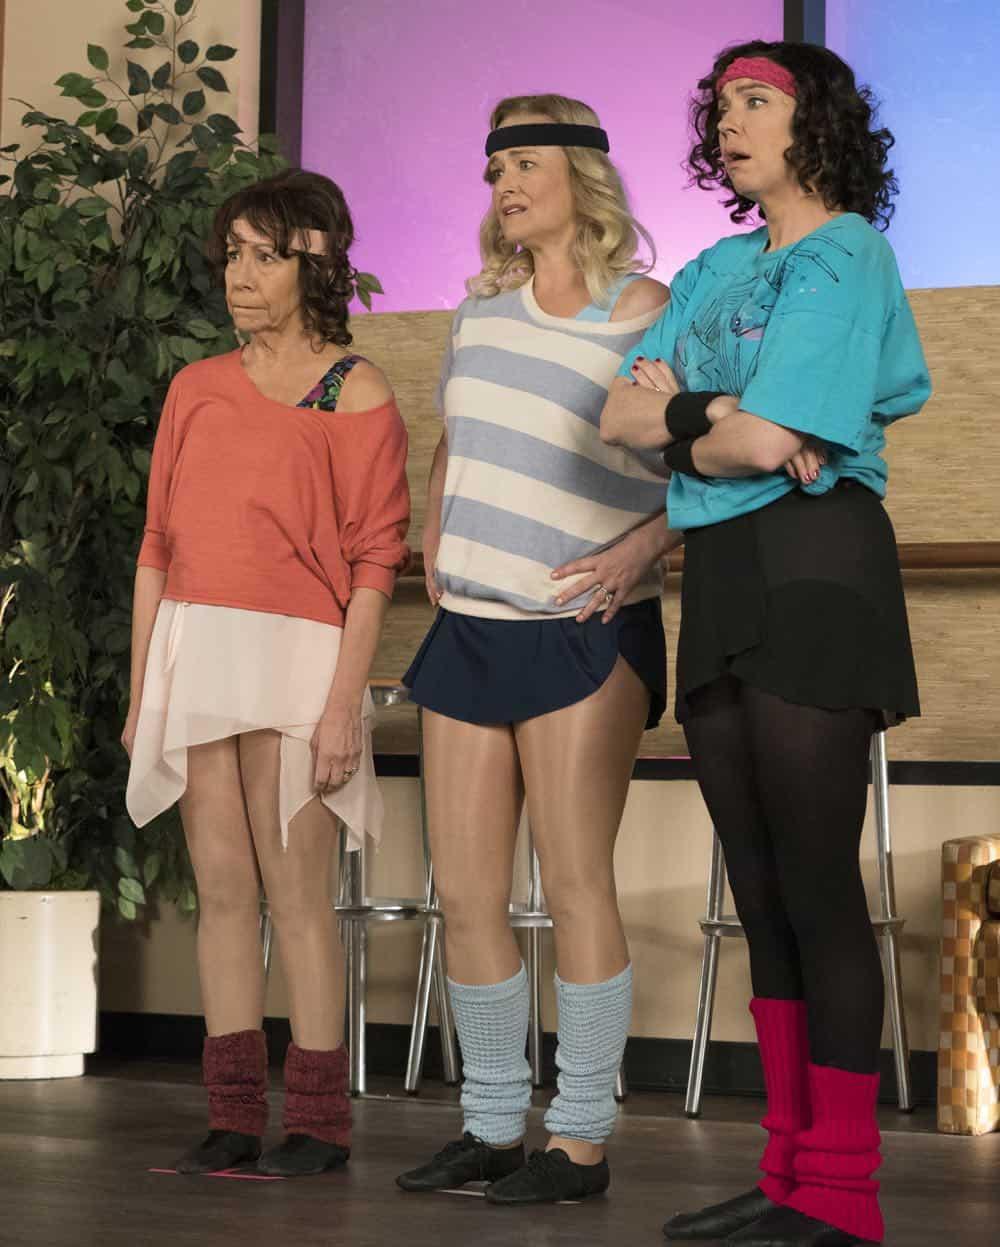 The Goldbergs Episode 19 Season 5 Flashy Little Flashdancer 09